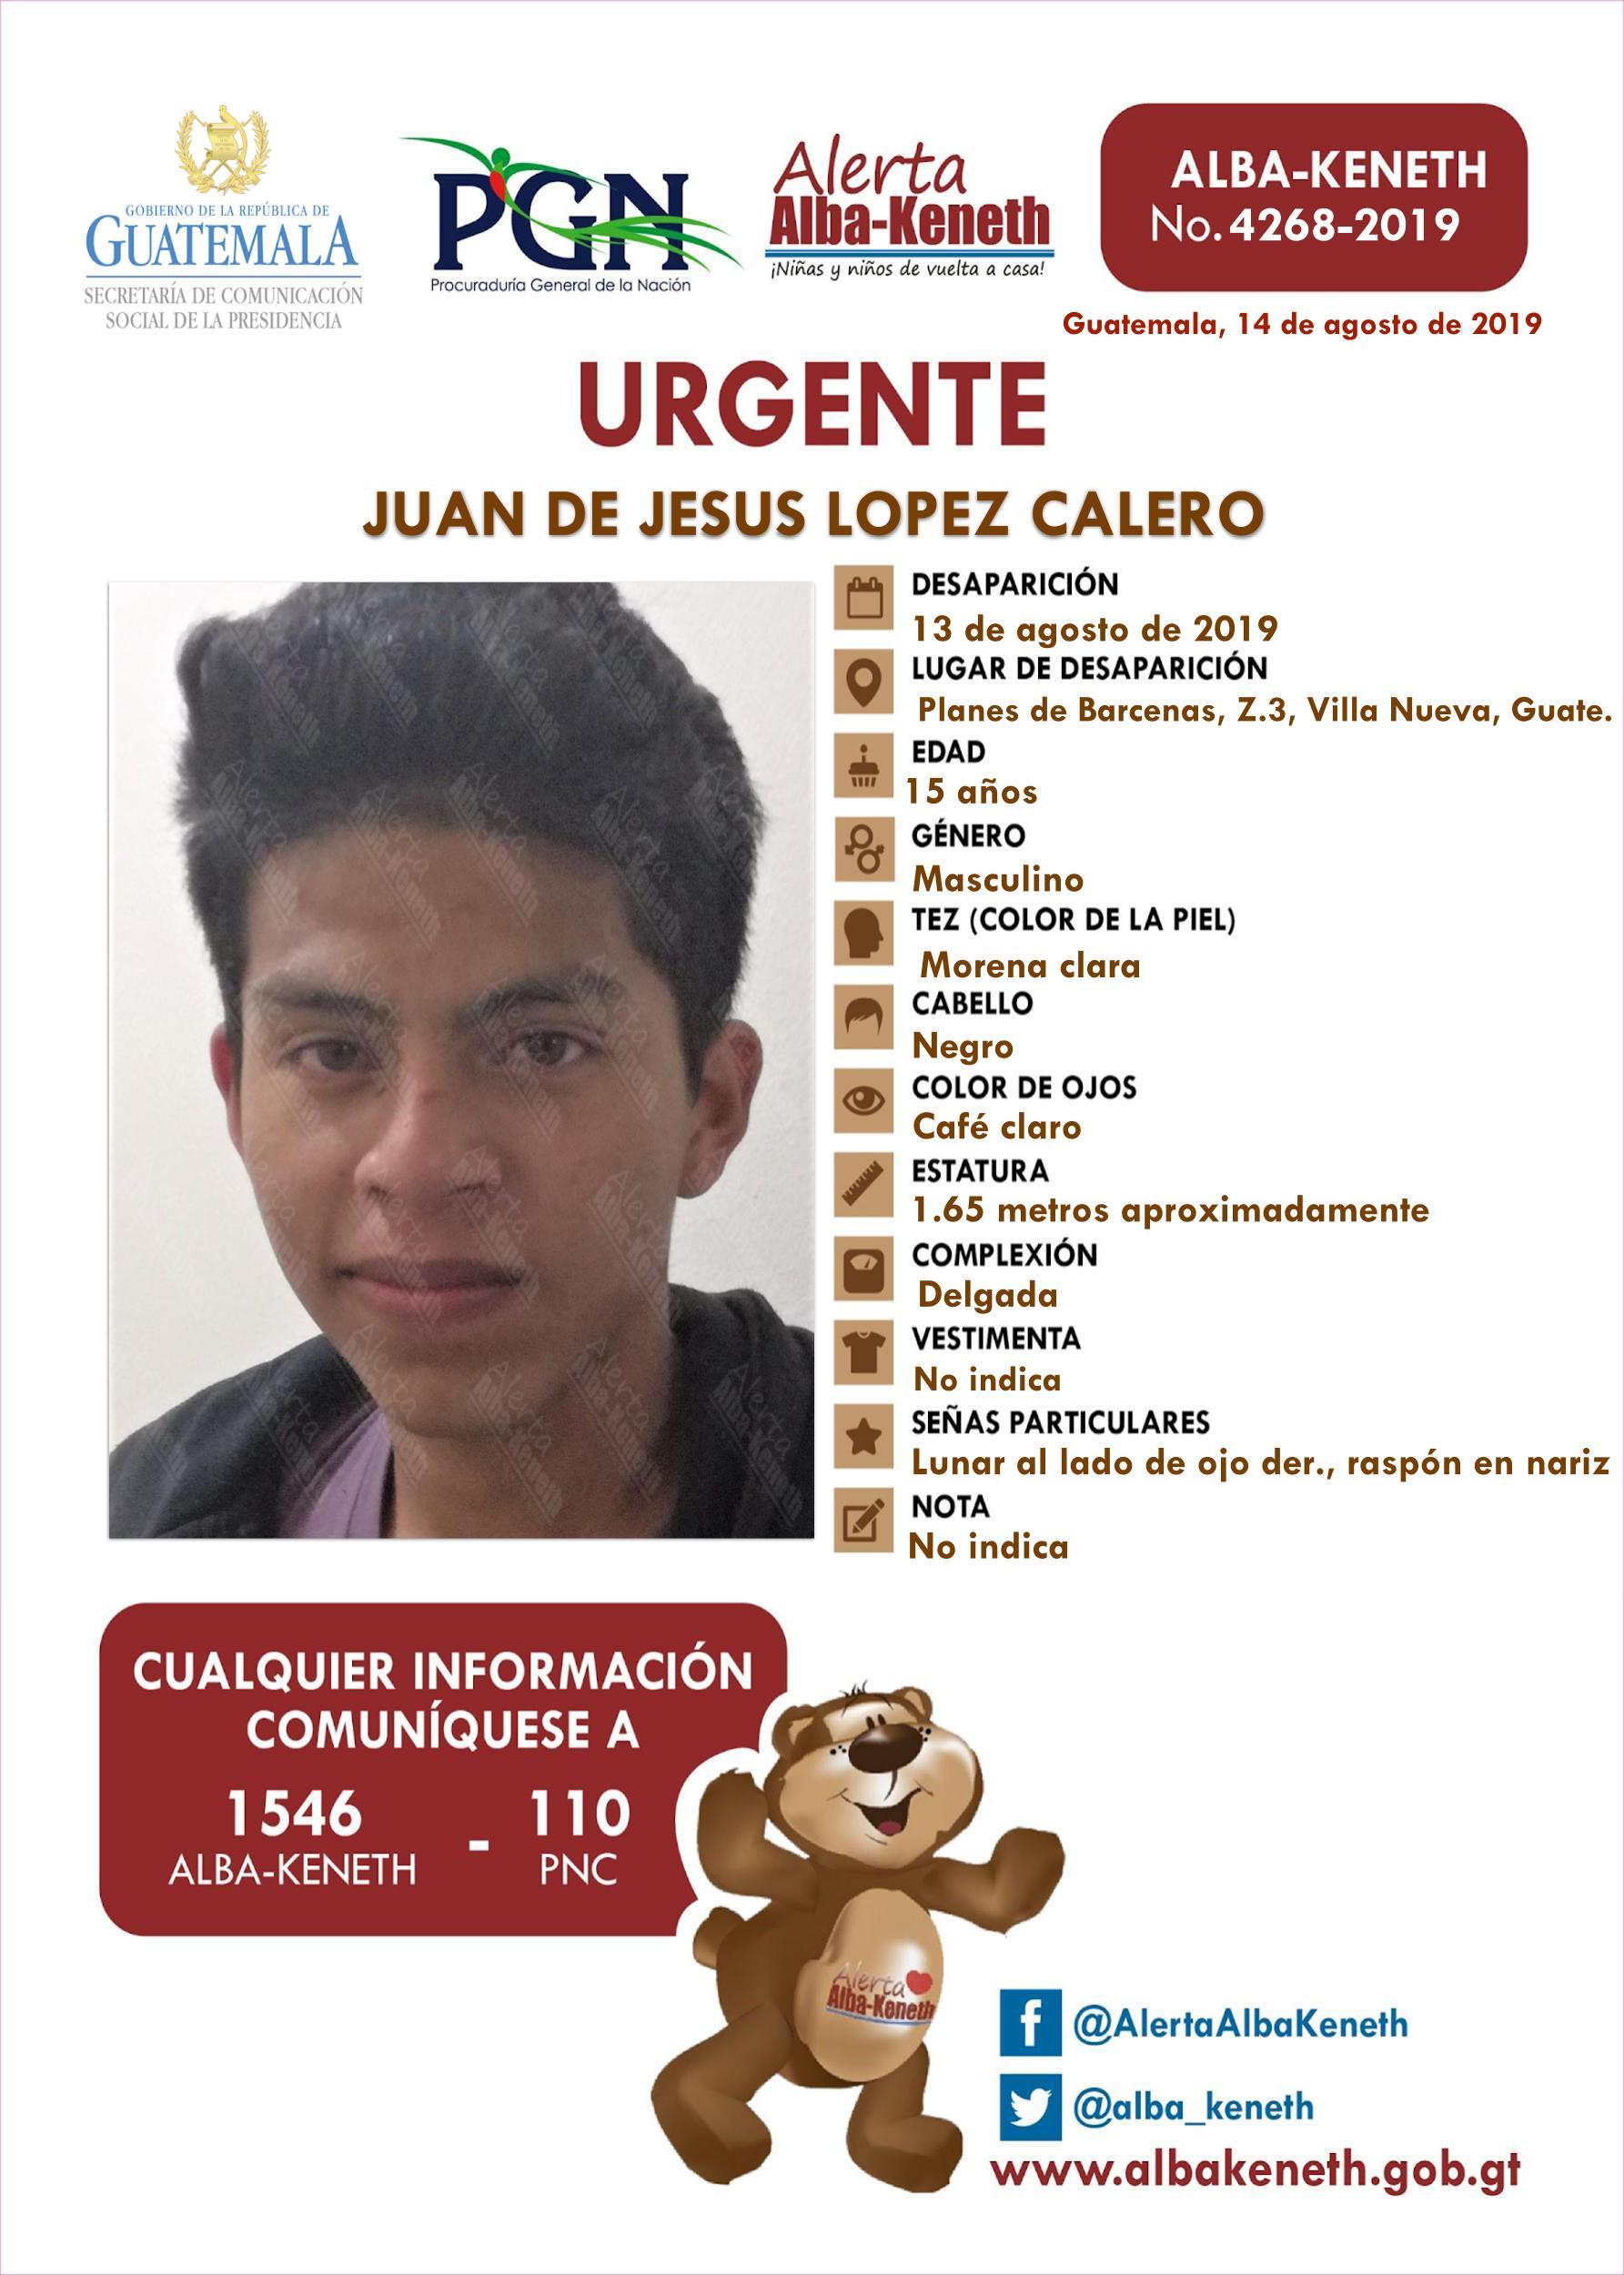 Juan de Jesus Lopez Calero